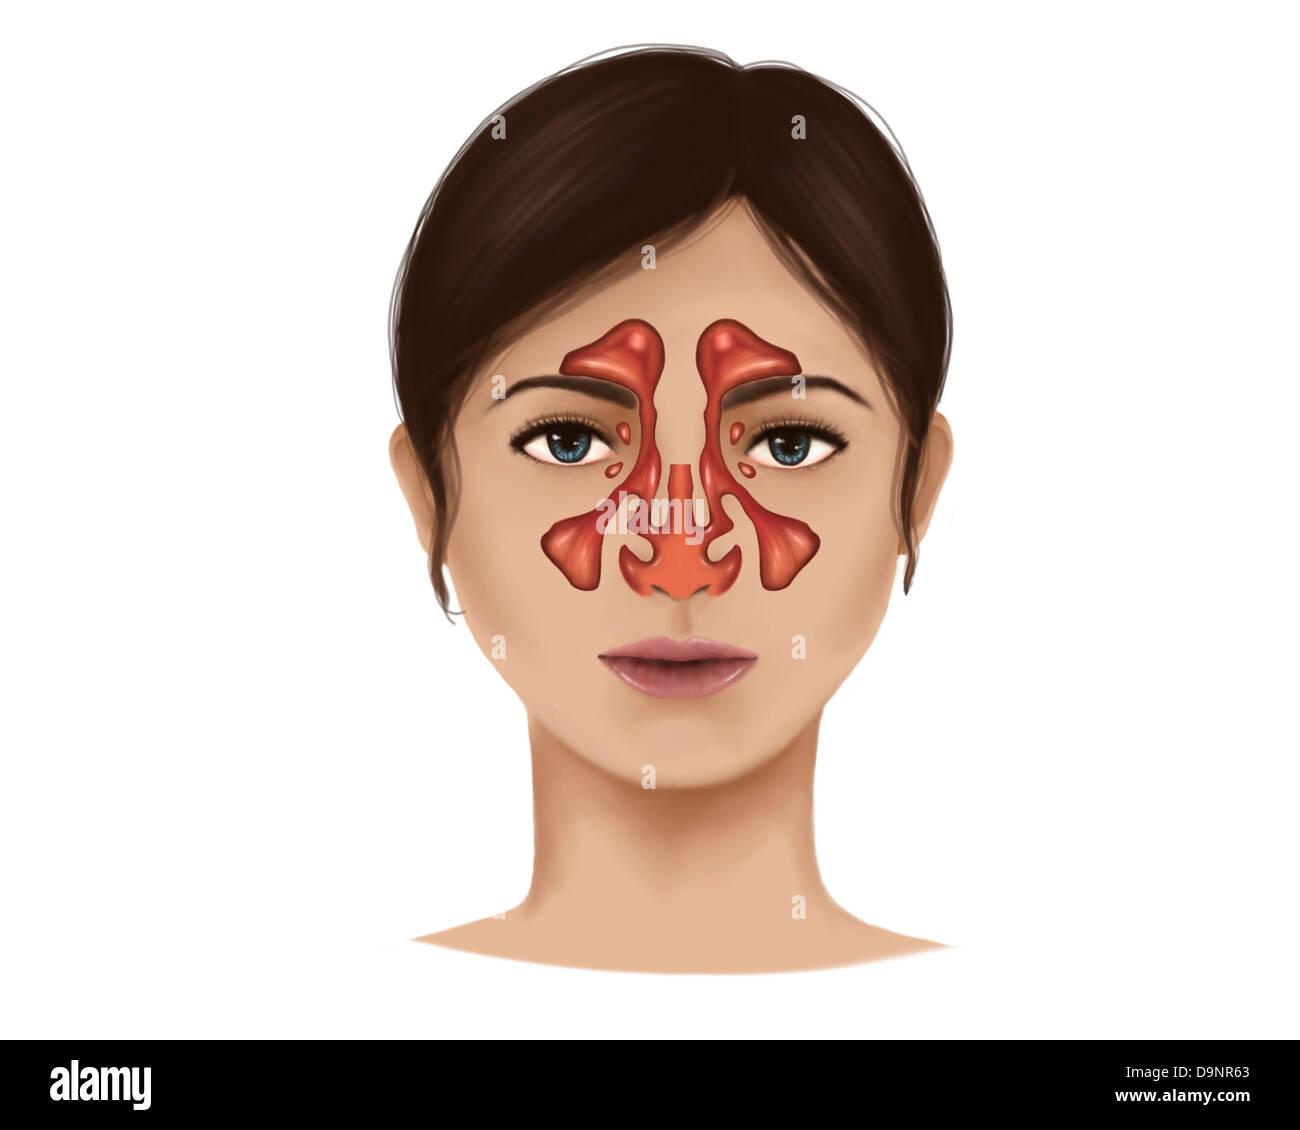 Anatomie der Nasennebenhöhlen Stockfoto, Bild: 57642203 - Alamy